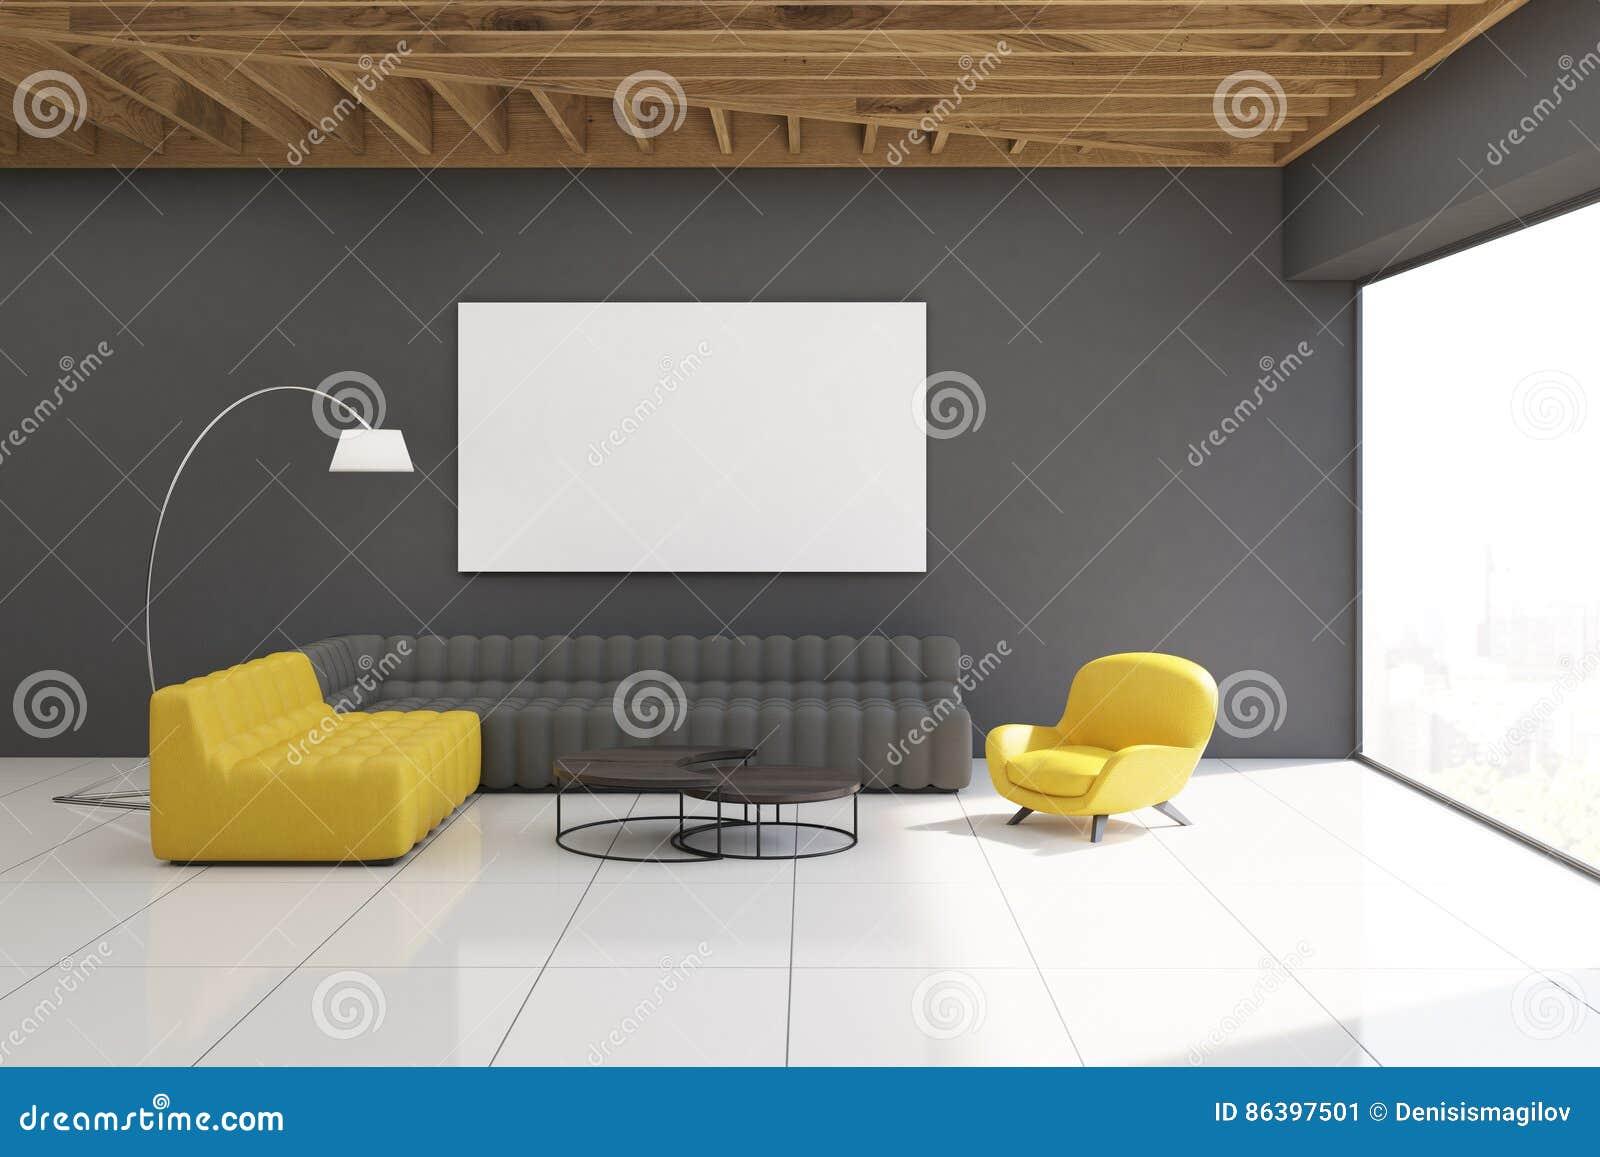 Yellow And Gray Living Room Gray Living Room Interior Stock Illustration Image 86397501